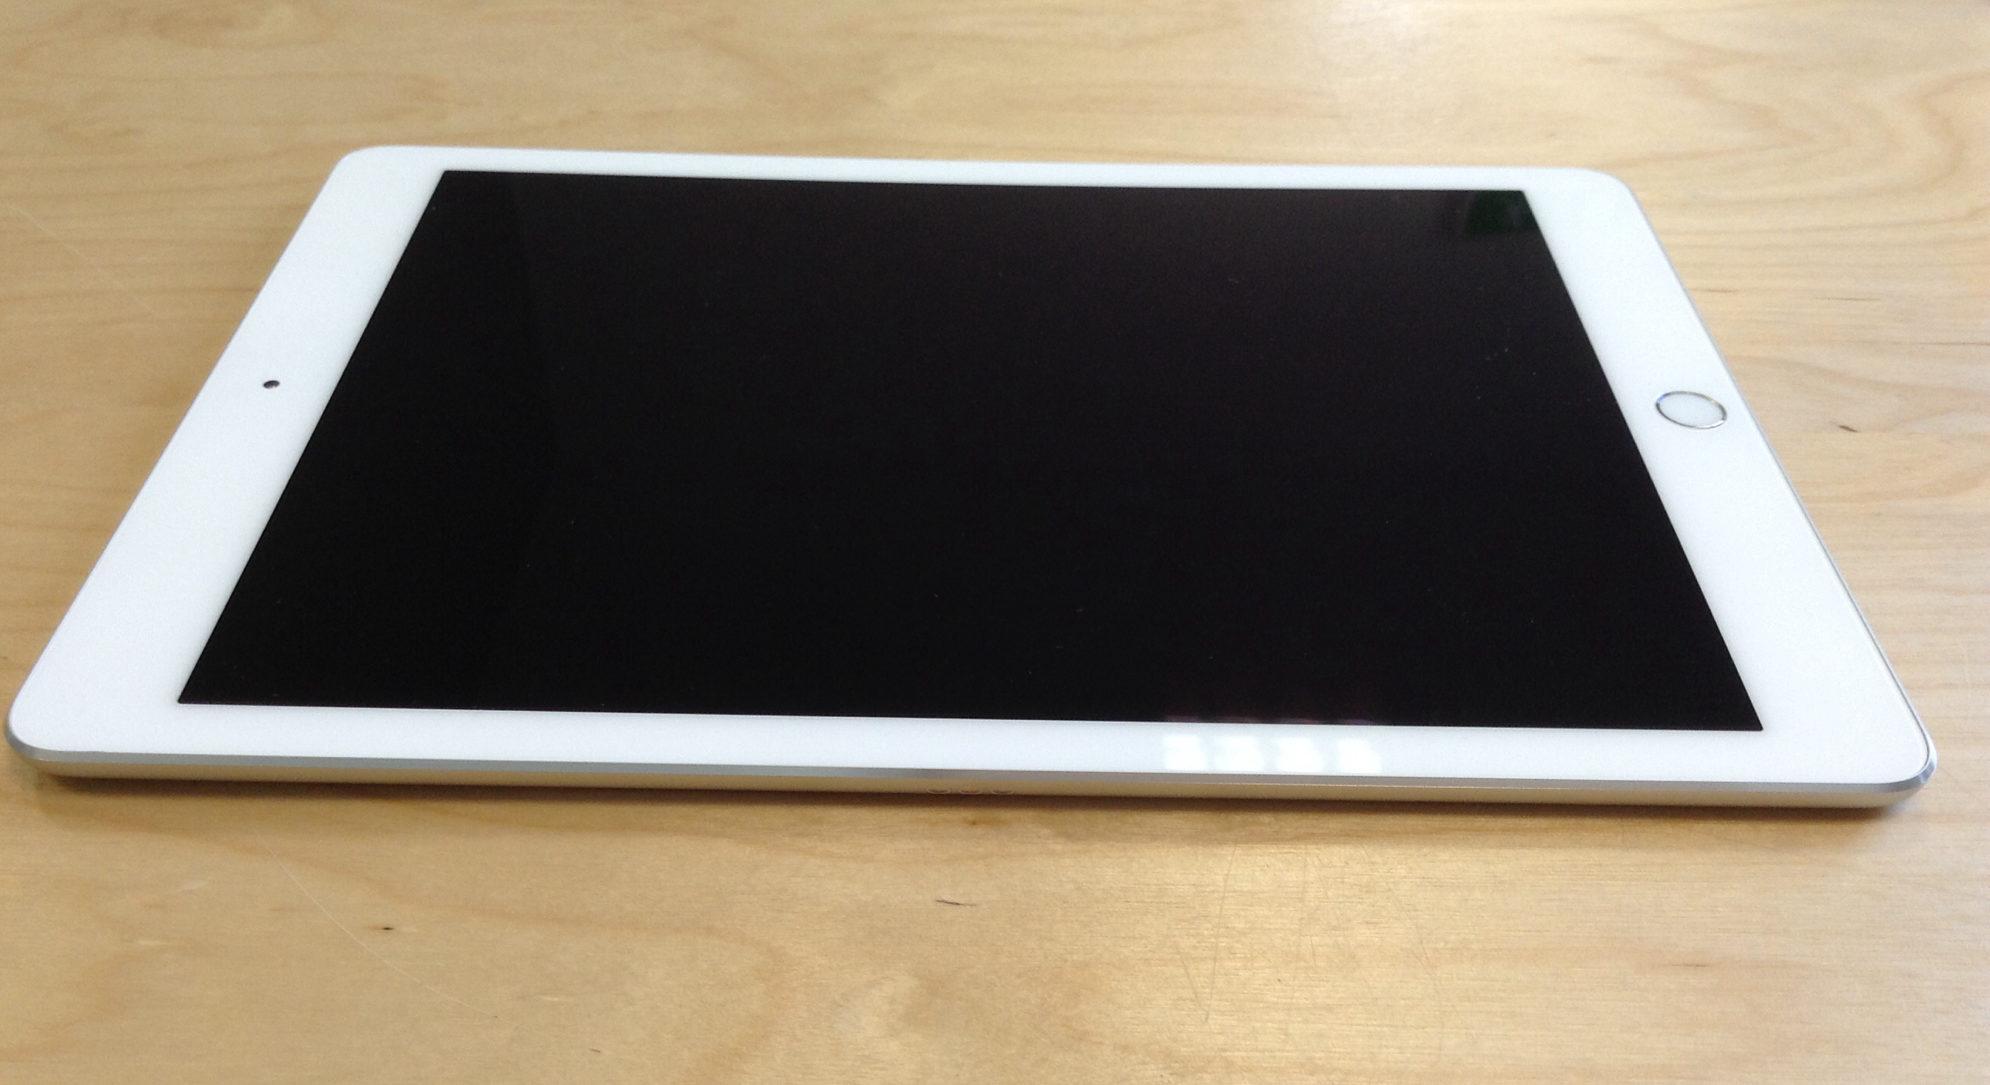 iPad Pro 9.7-inch (Wi-Fi), 128 GB, Gold, imagen 6